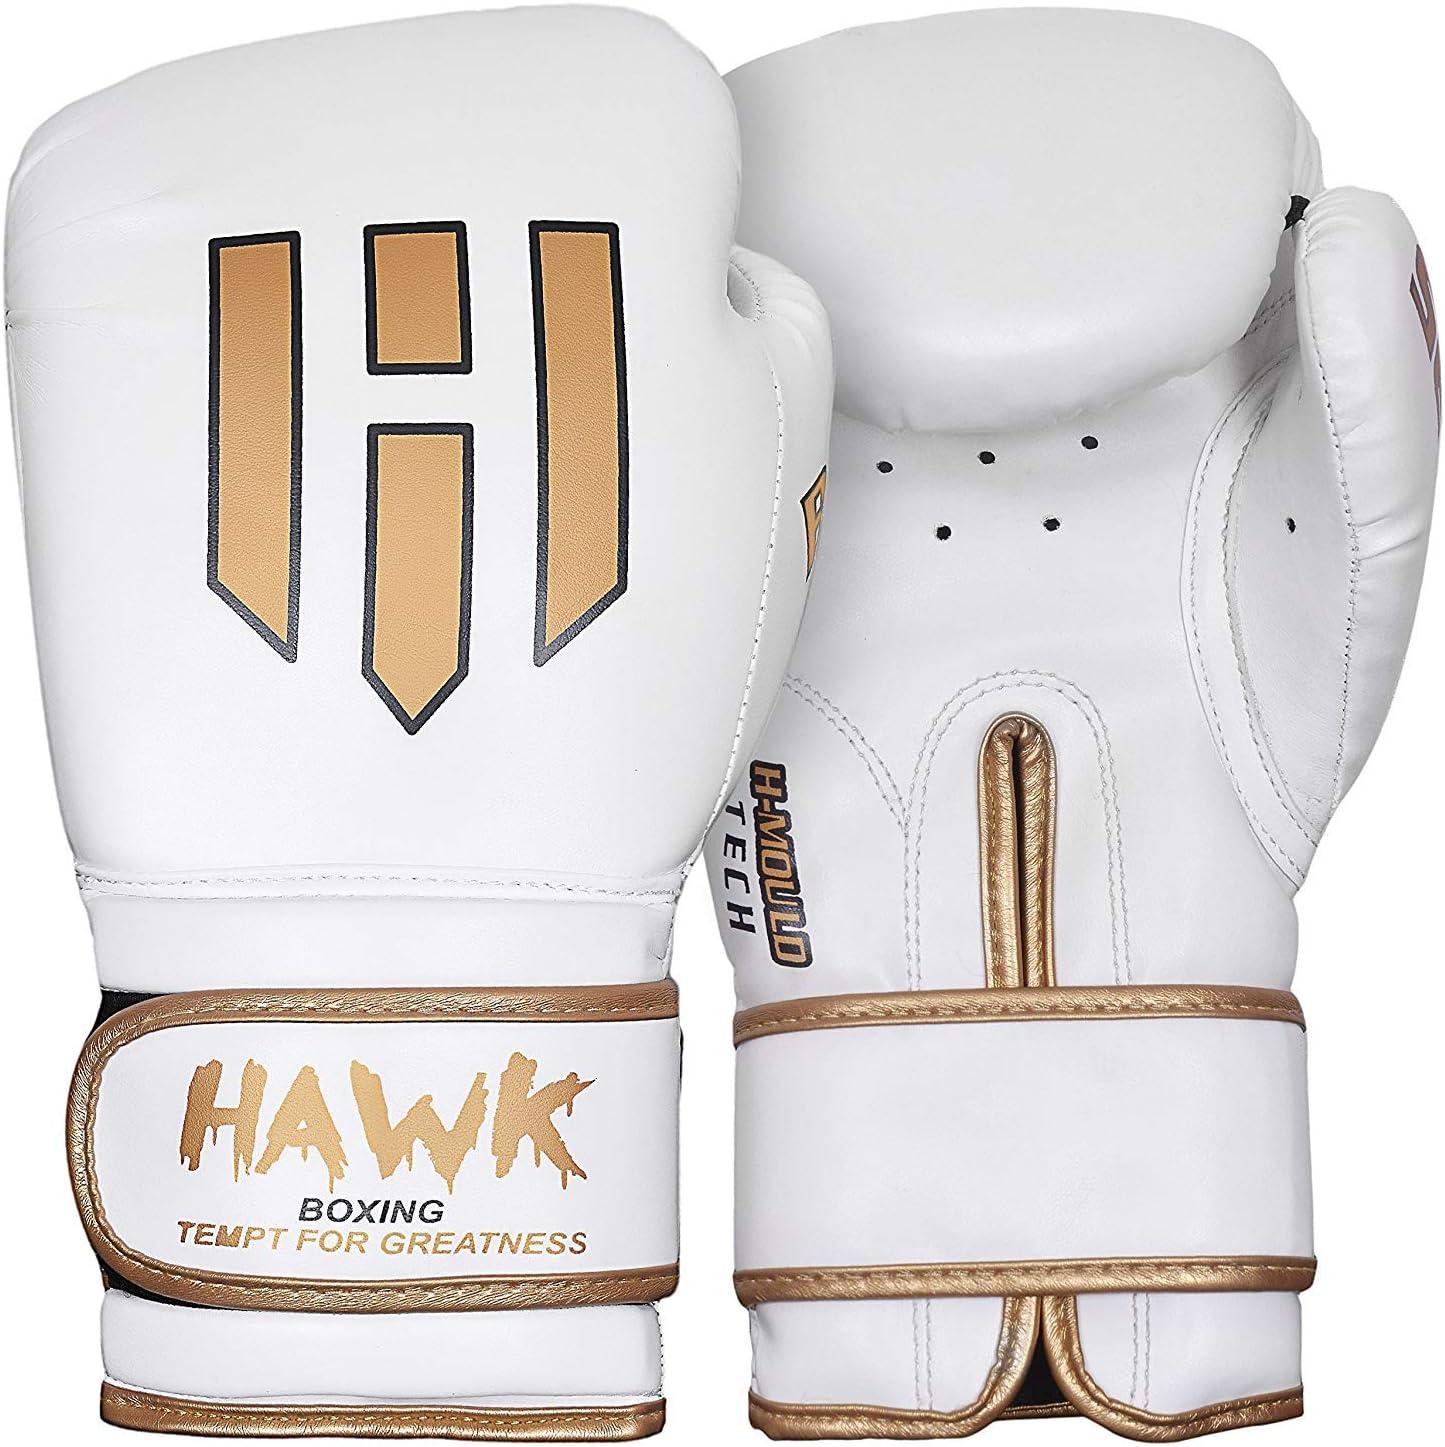 Hawk Boxing Gloves for Men & Women Training Pro Punching Heavy Bag Mitts MMA Muay Thai Sparring Kickboxing Gloves